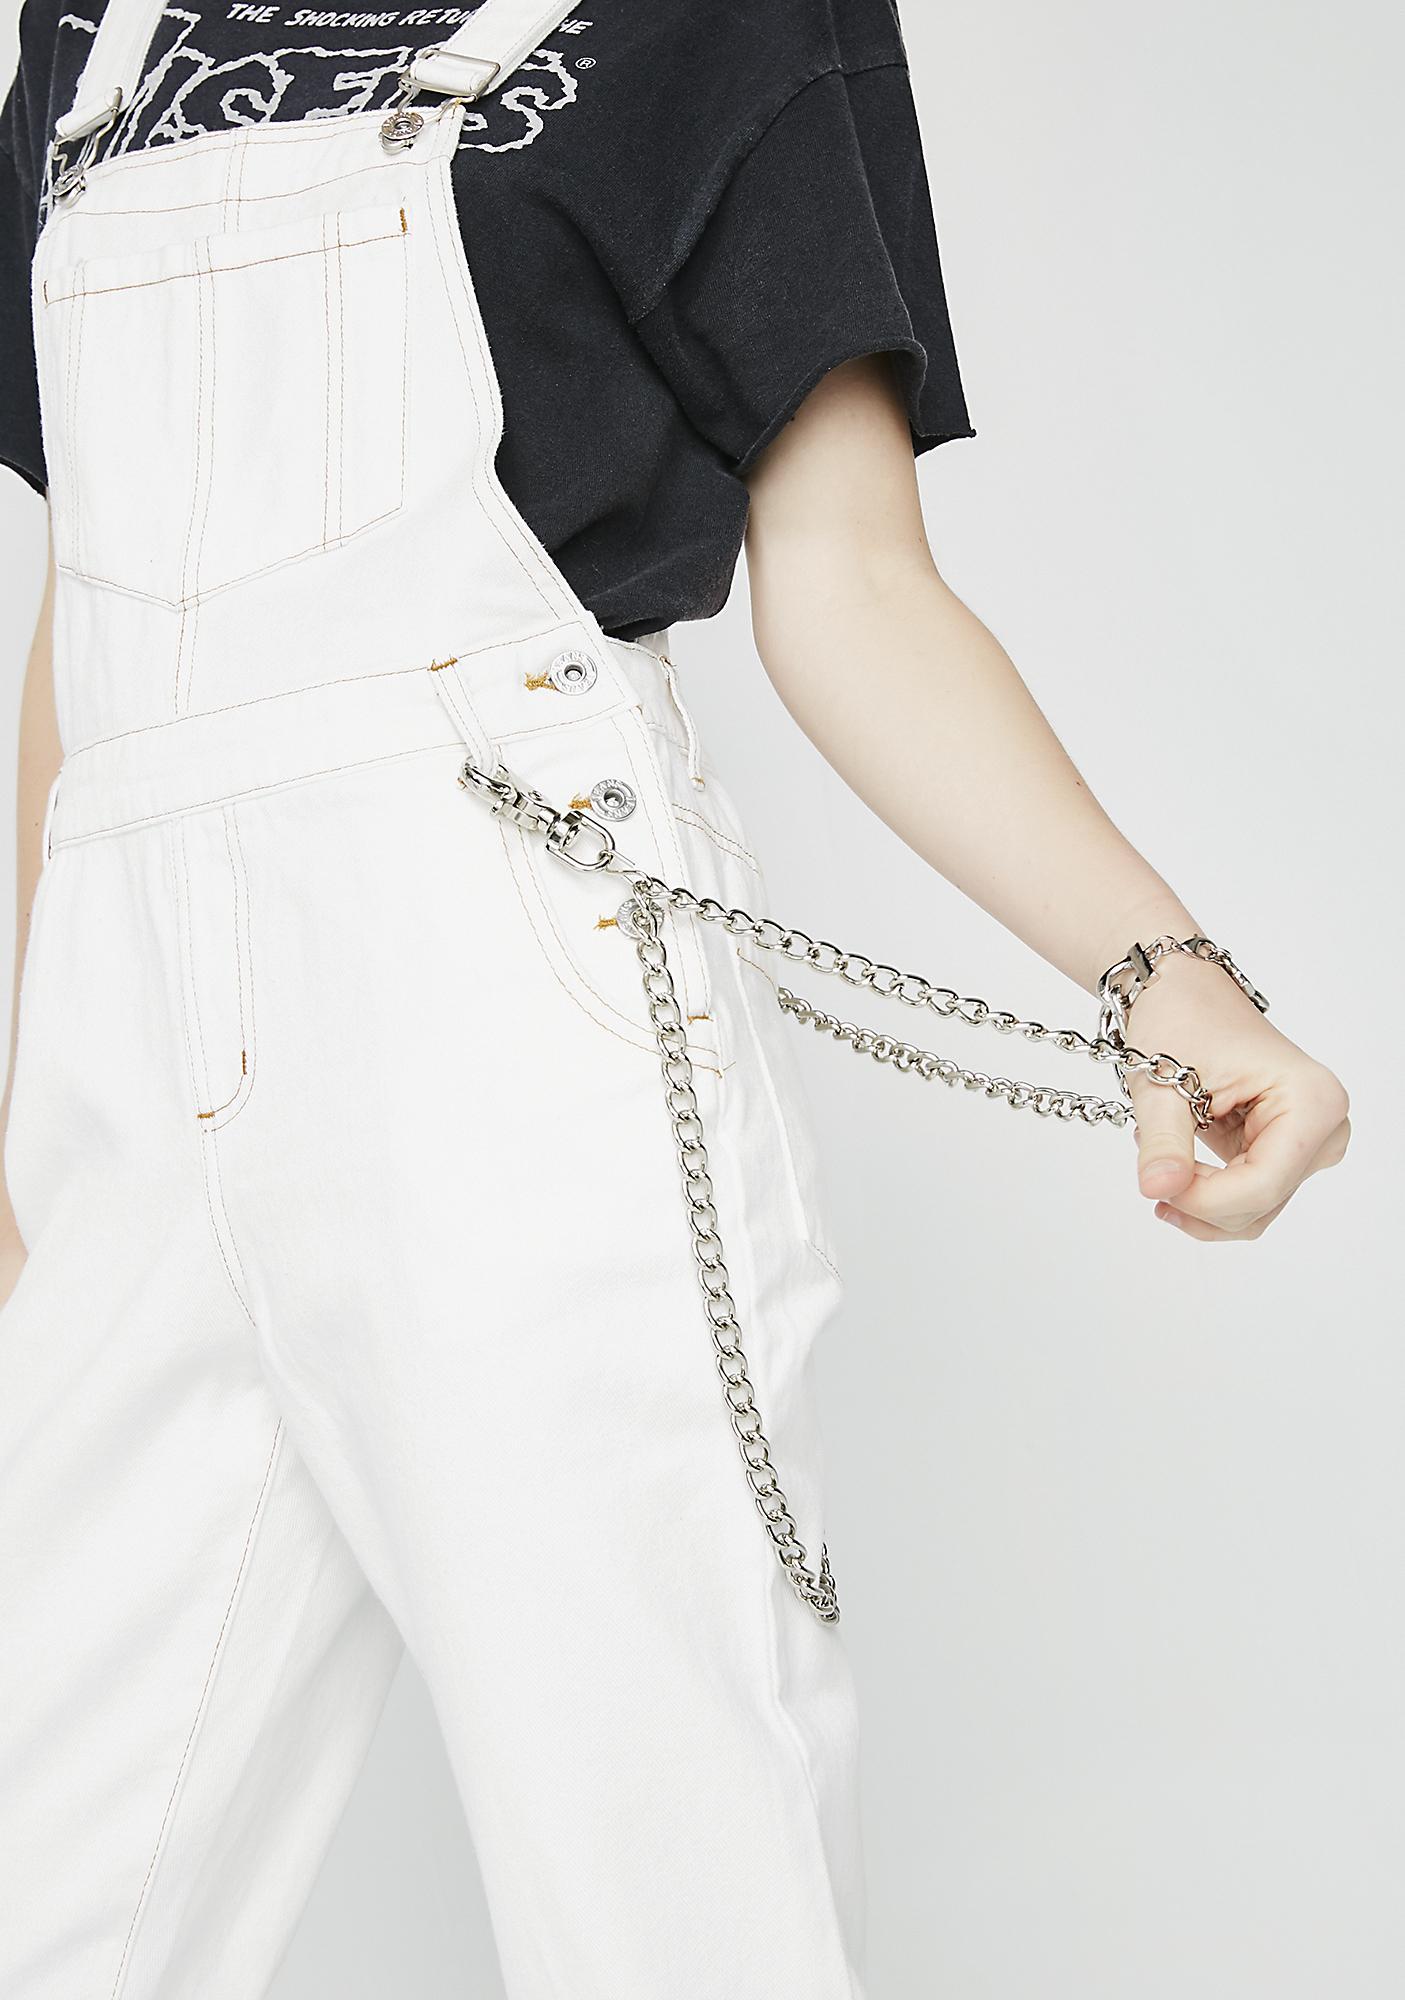 Hang Low Chain